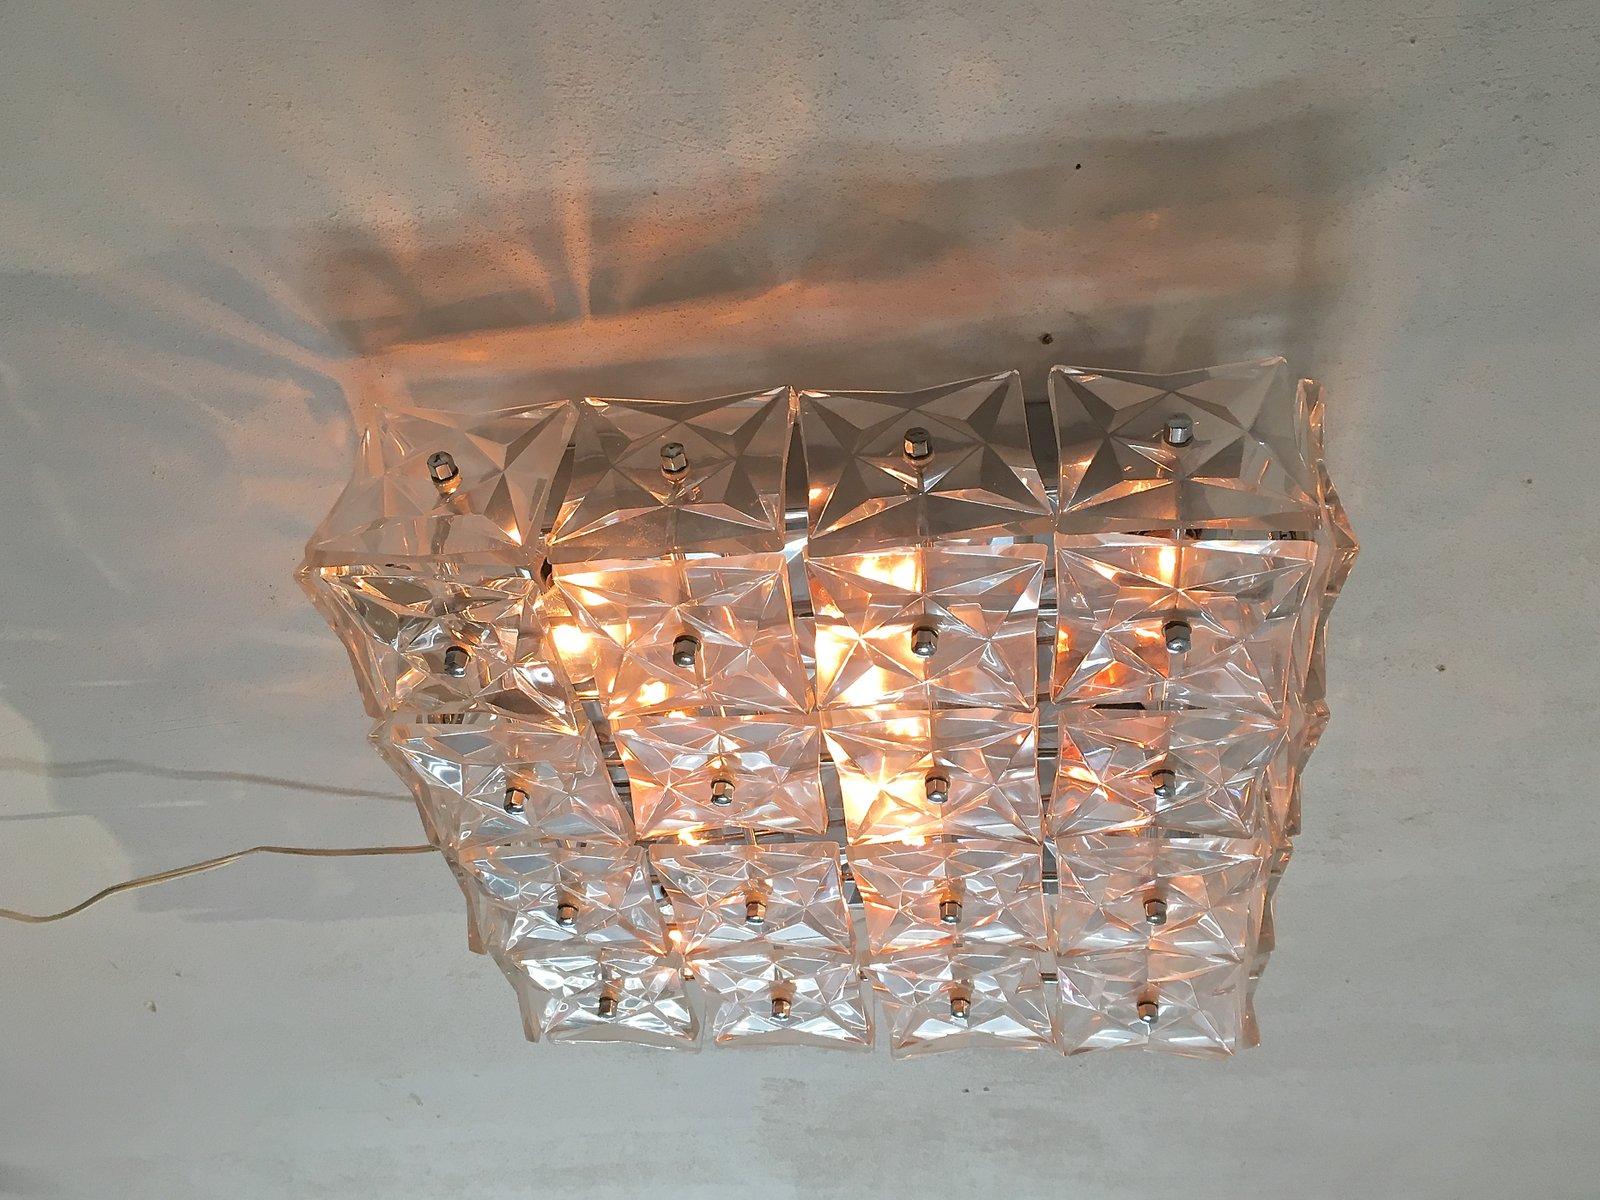 Grande applique murale ou plafonnier en verre cristal de for Applique murale en verre